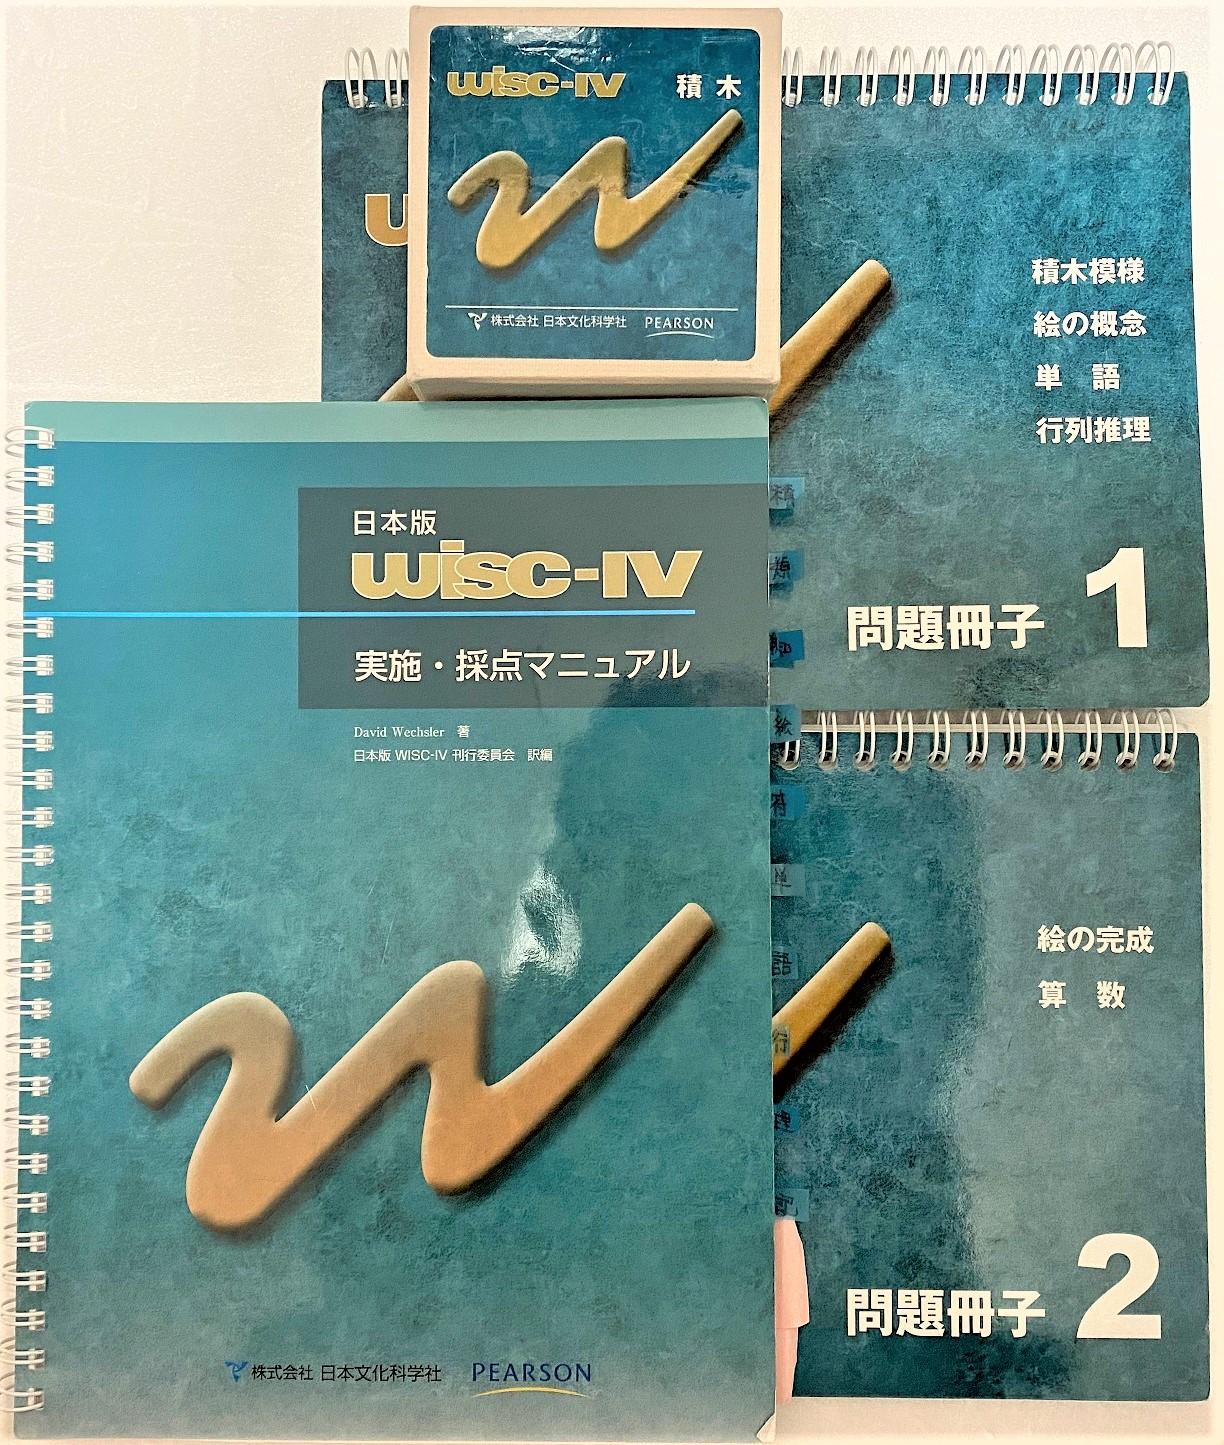 008【WISC-Ⅳ】WISC4(ウィスク4)検査をとる理由とは